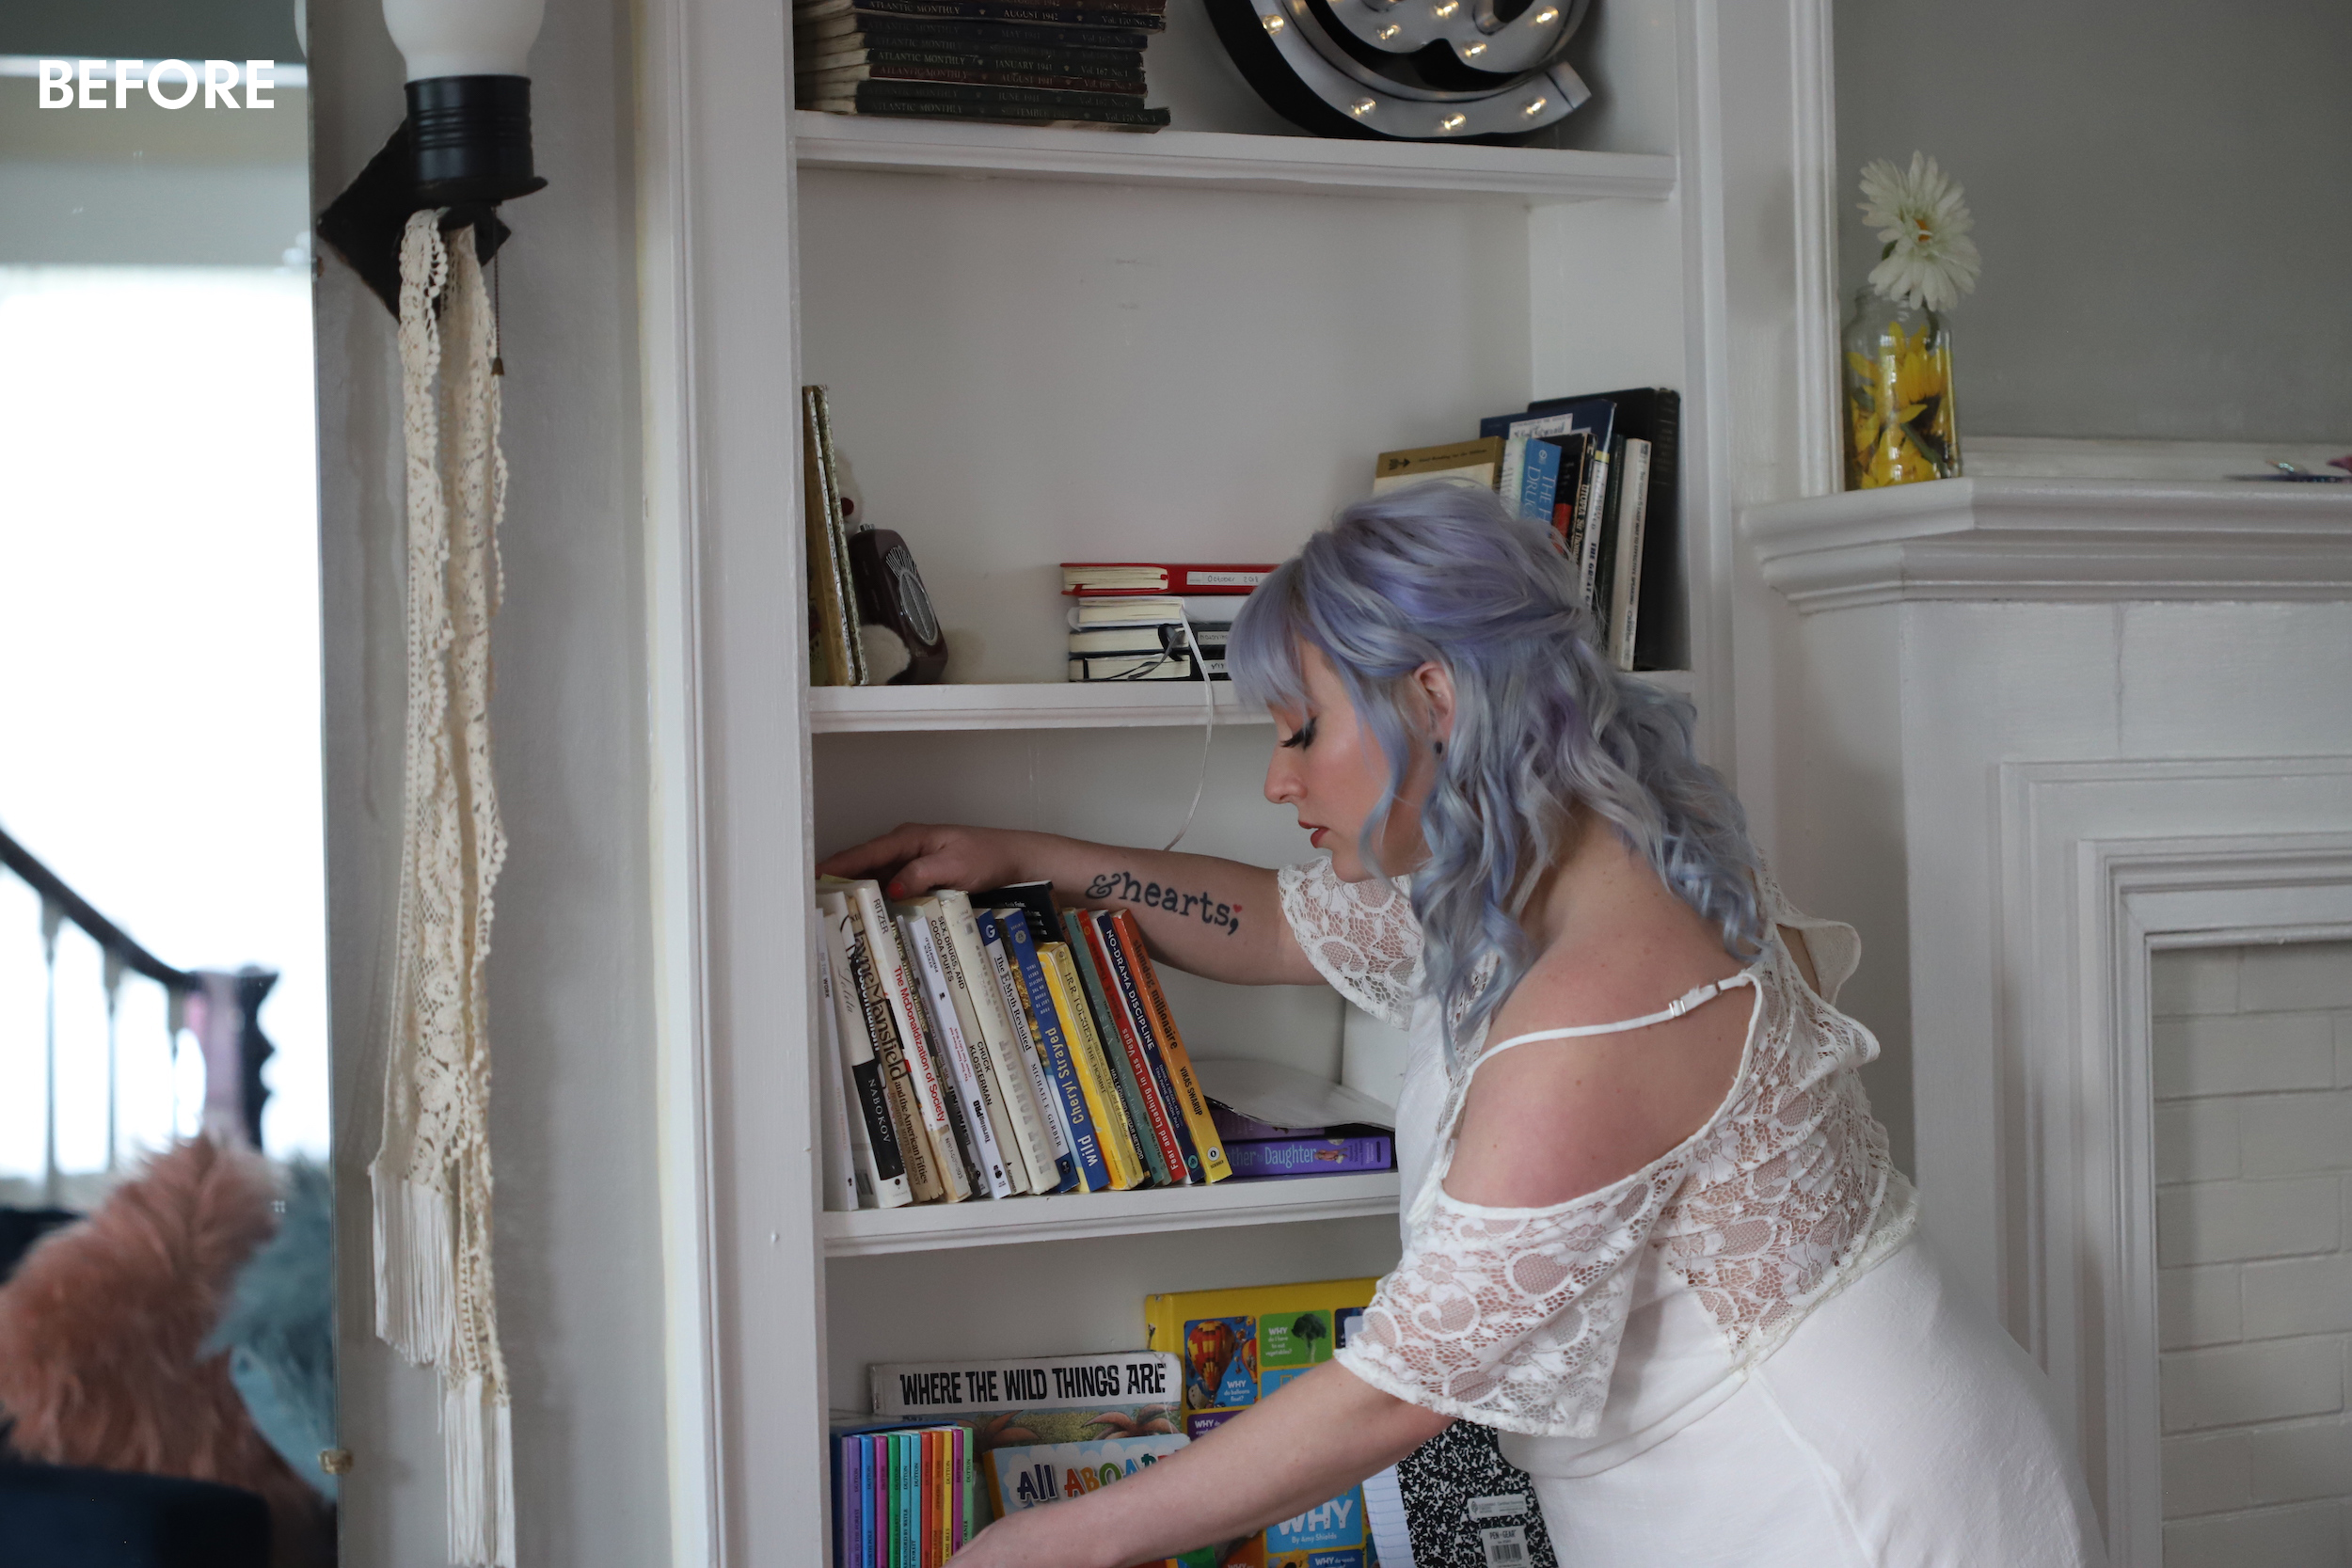 pink-josi-denise-lavender-hair-blogger-bookshelflavender-hair-blogger-bookshelfchickpeach-lightroom-presets2.jpg